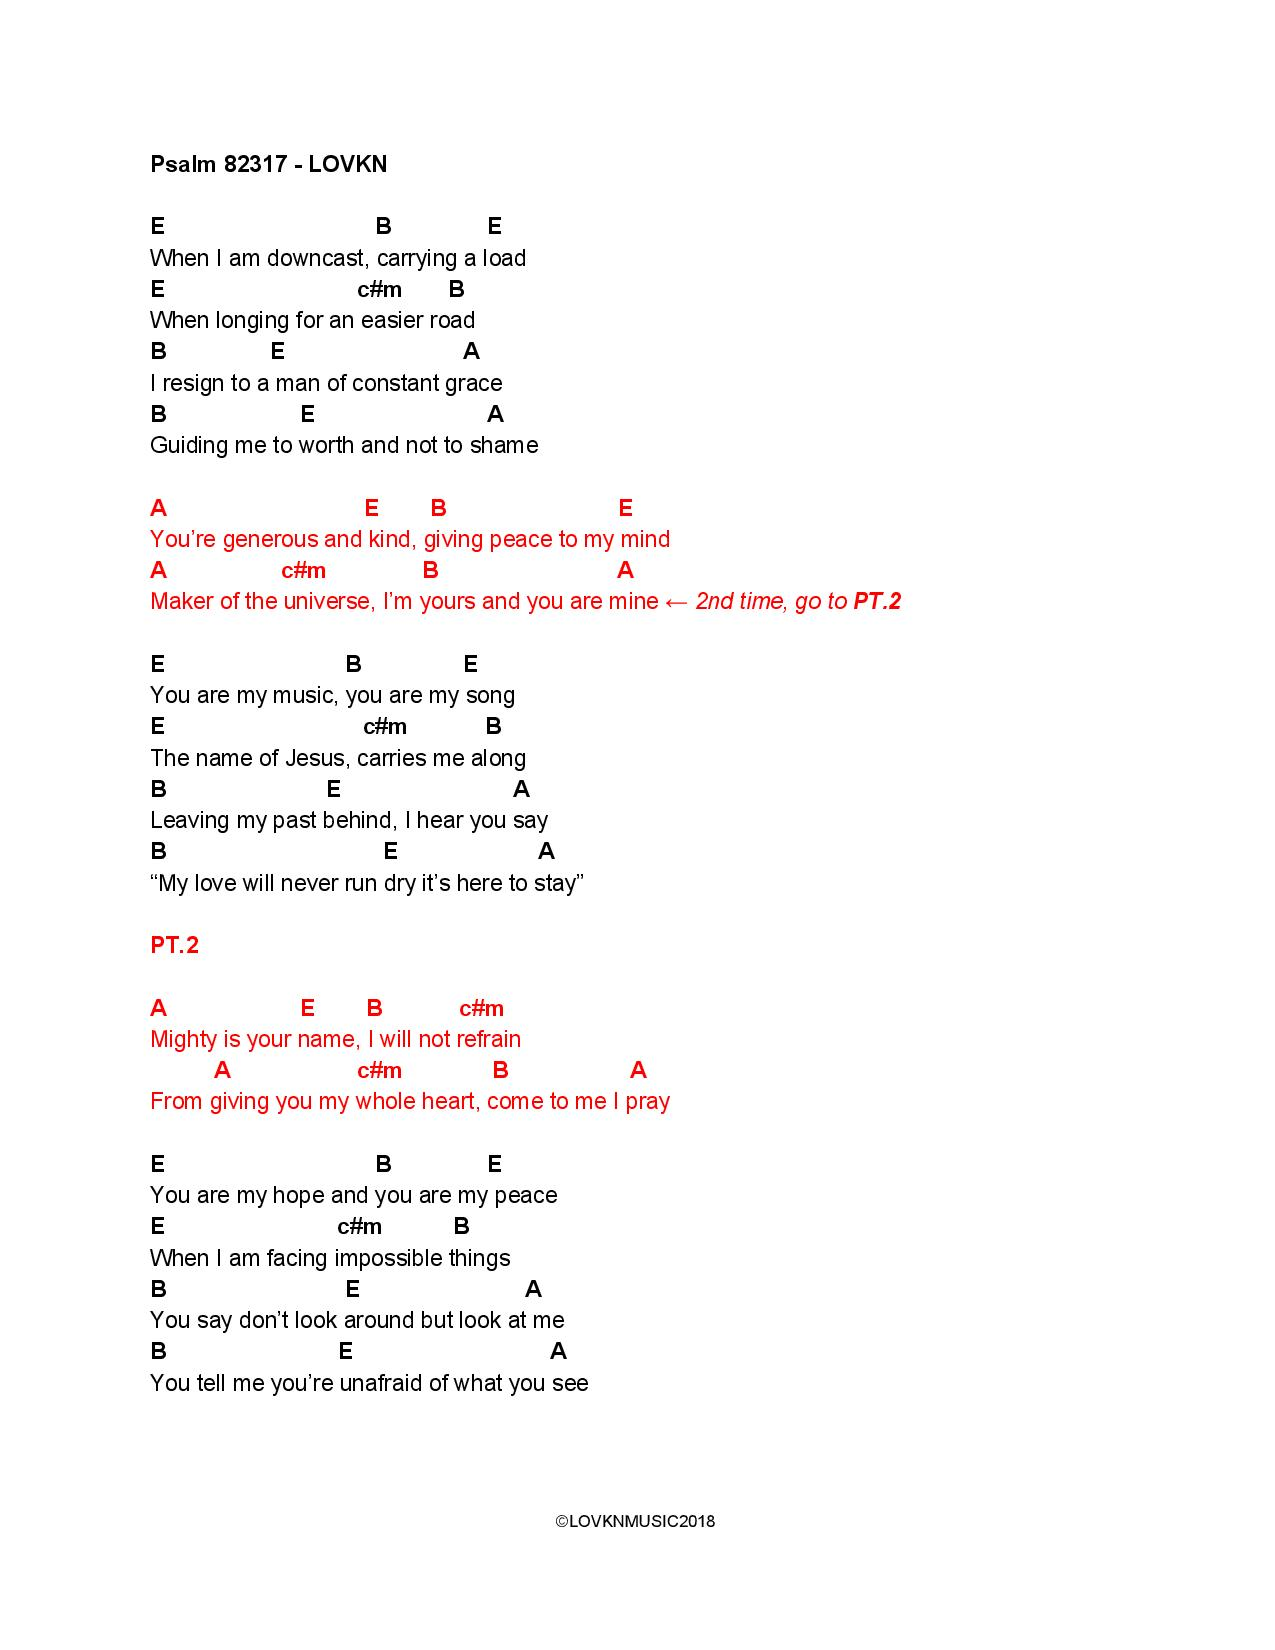 Psalm 82317-page-001.jpg